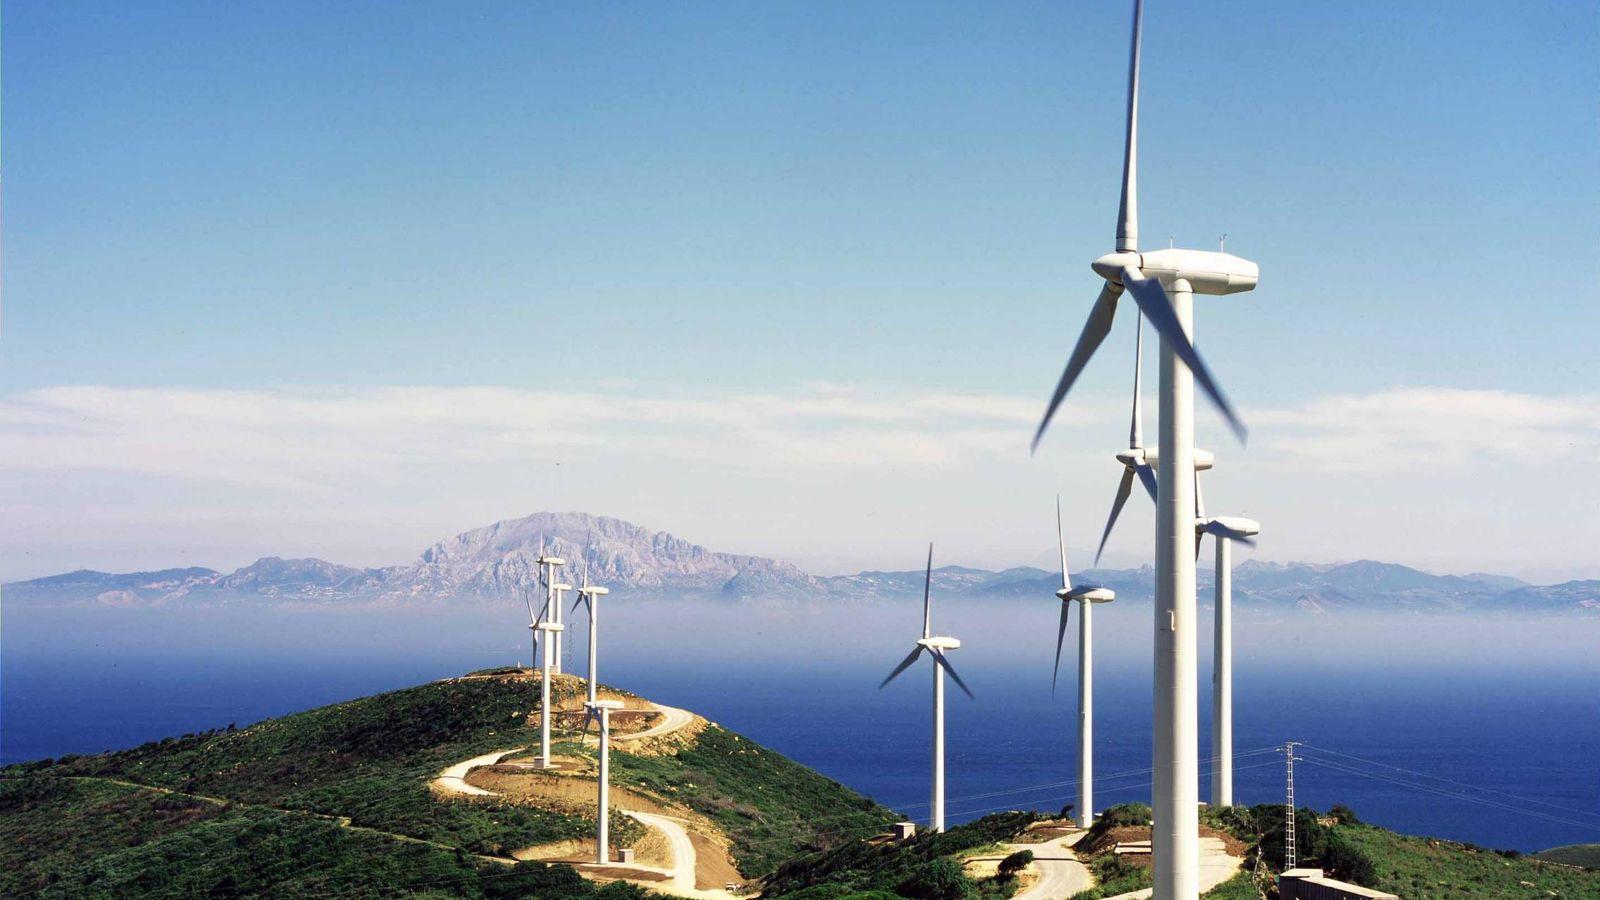 Foto: Parque eólico de Endesa en Tarifa. (Endesa)